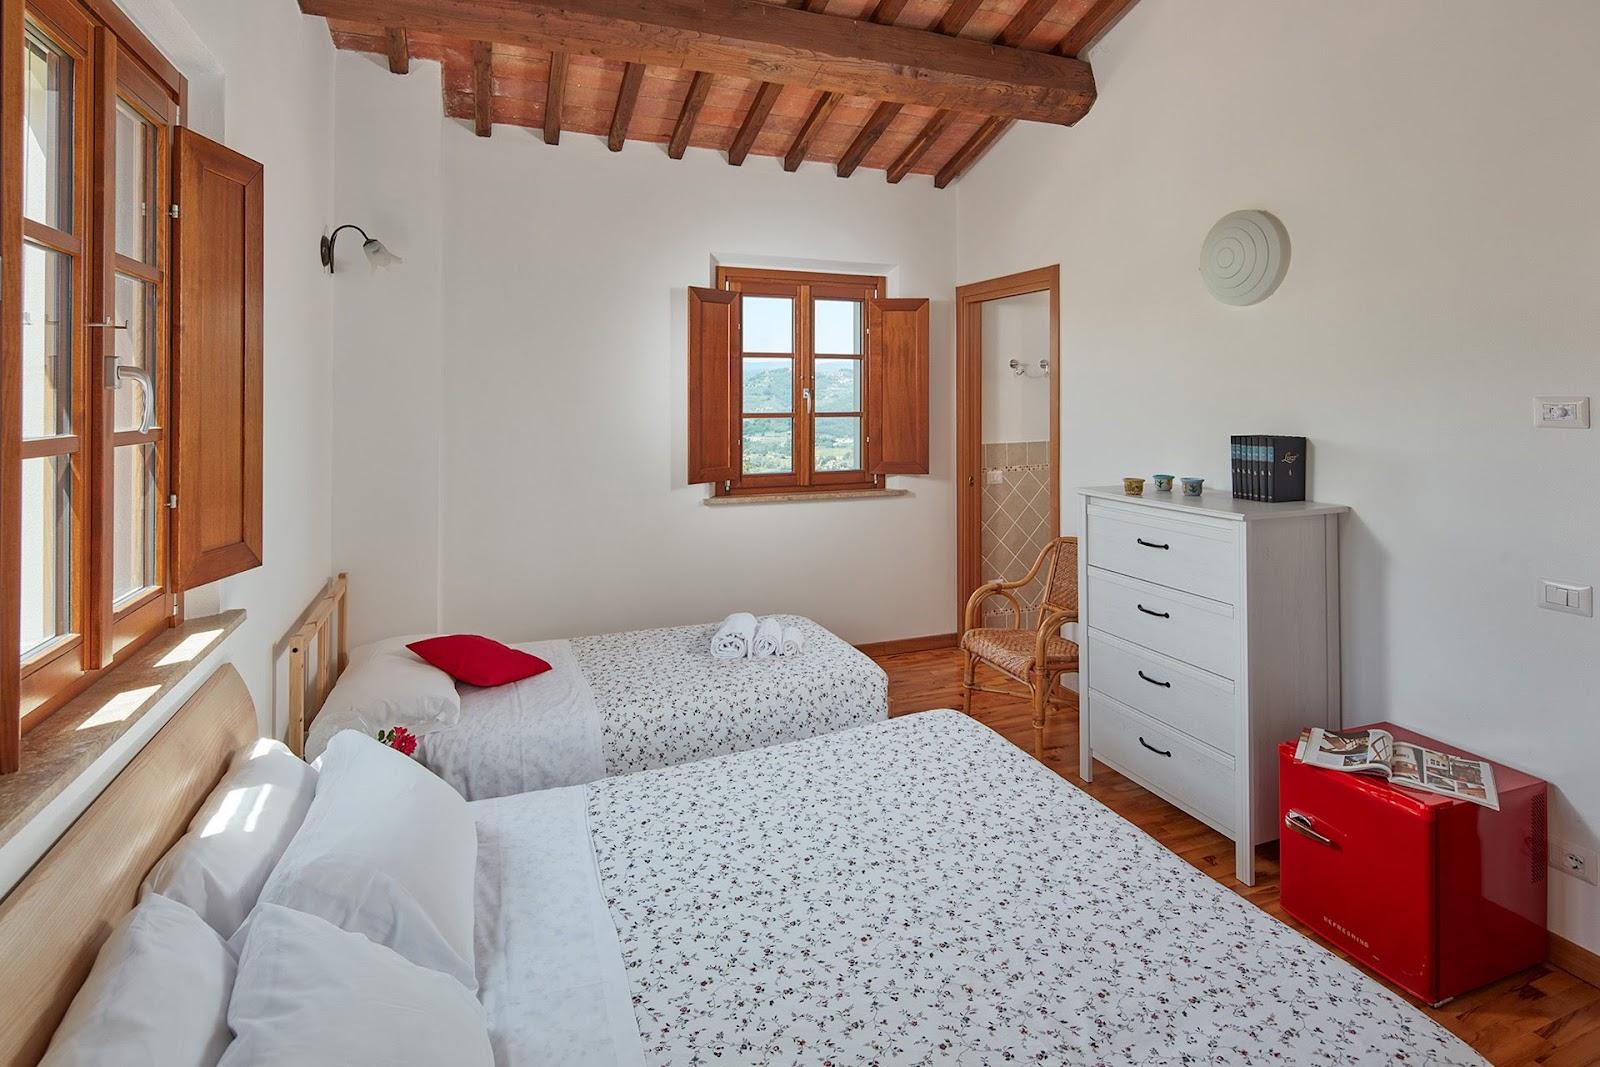 Ferienhaus Corte Paradiso (2570342), Monsummano Terme, Pistoia, Toskana, Italien, Bild 36